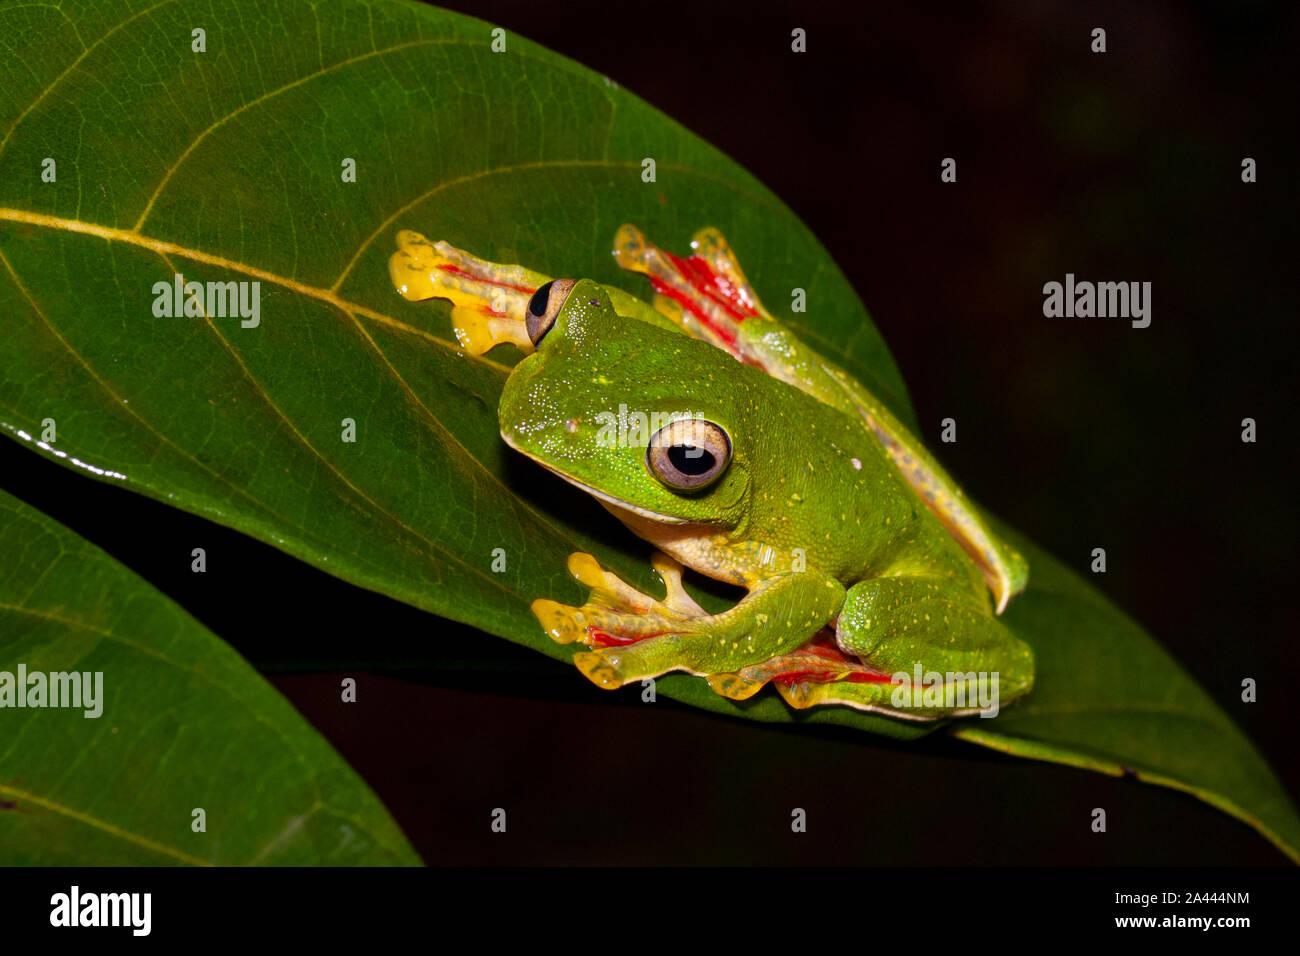 Rhacophorous Malabaricus ou Malabar Deltaplane Frog vu à Amboli,Maharashtra, Inde Banque D'Images